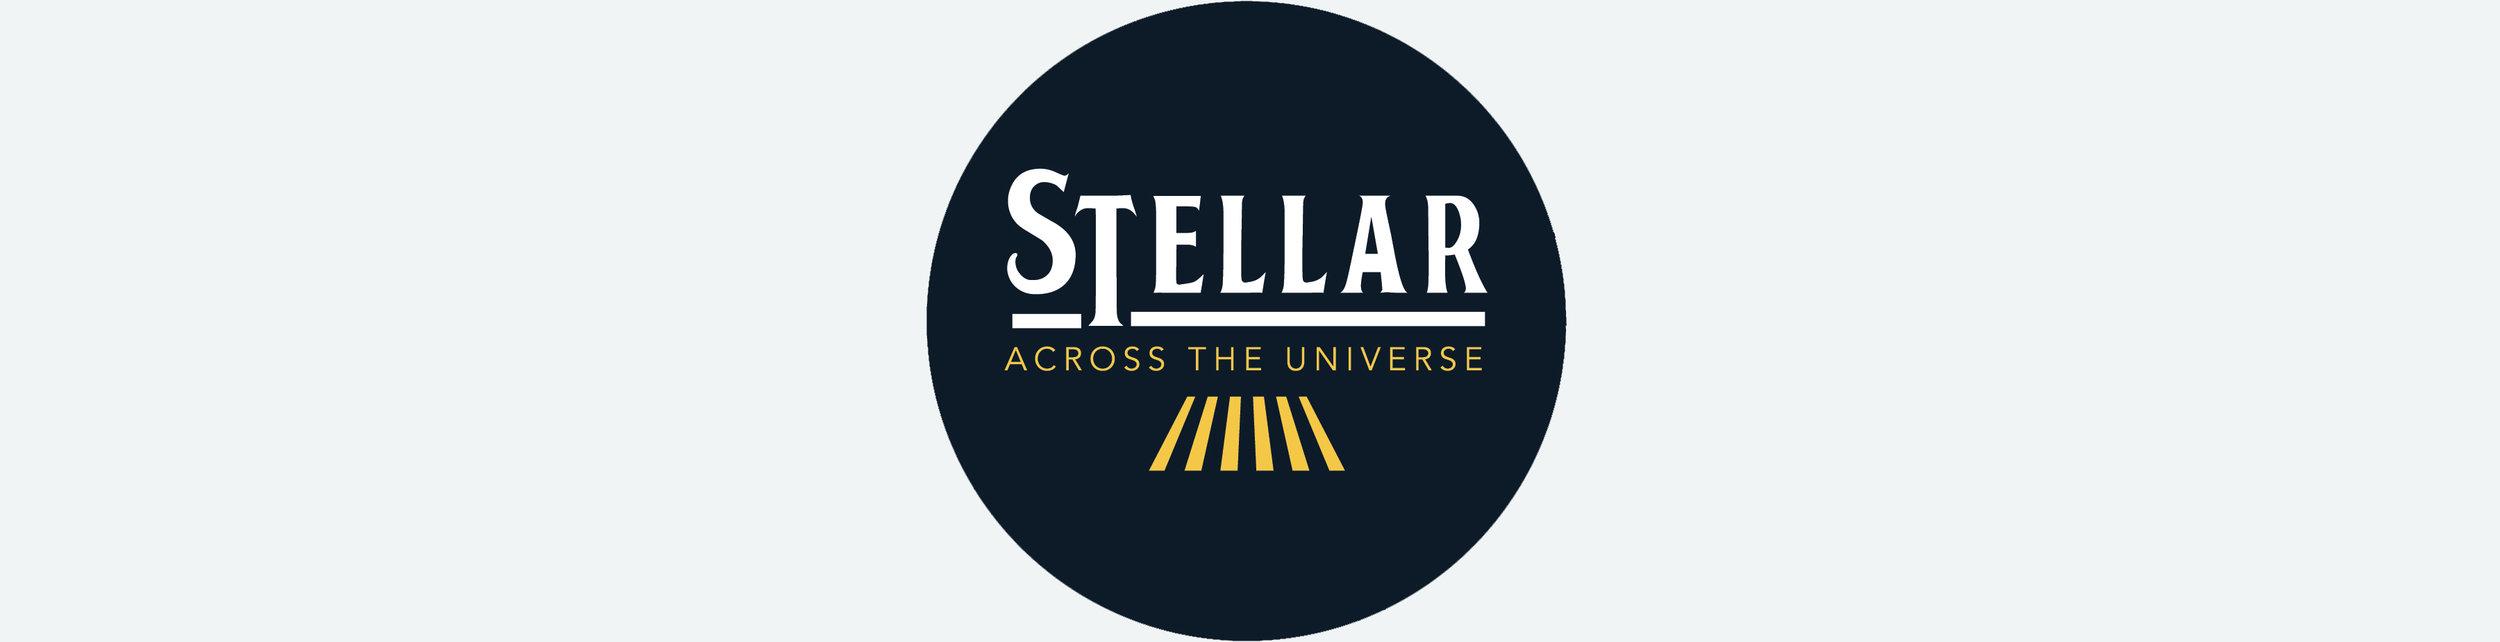 Stellar ATU Header Website.jpg